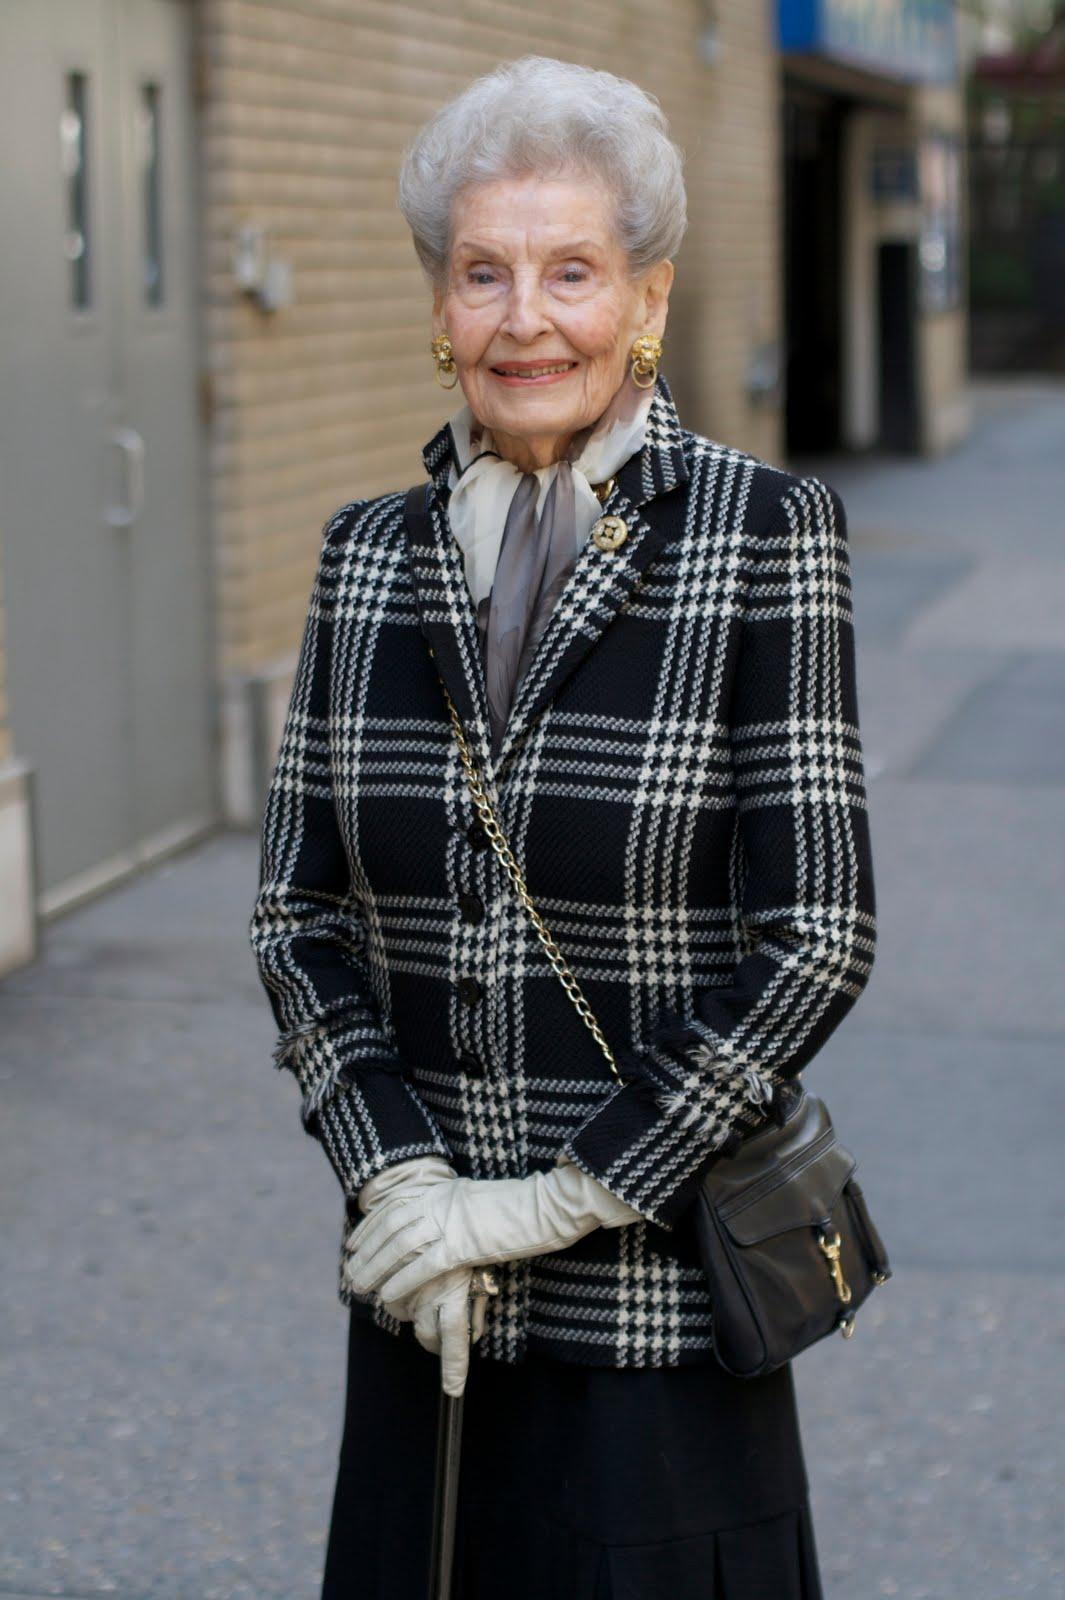 Old lady fashion show 14